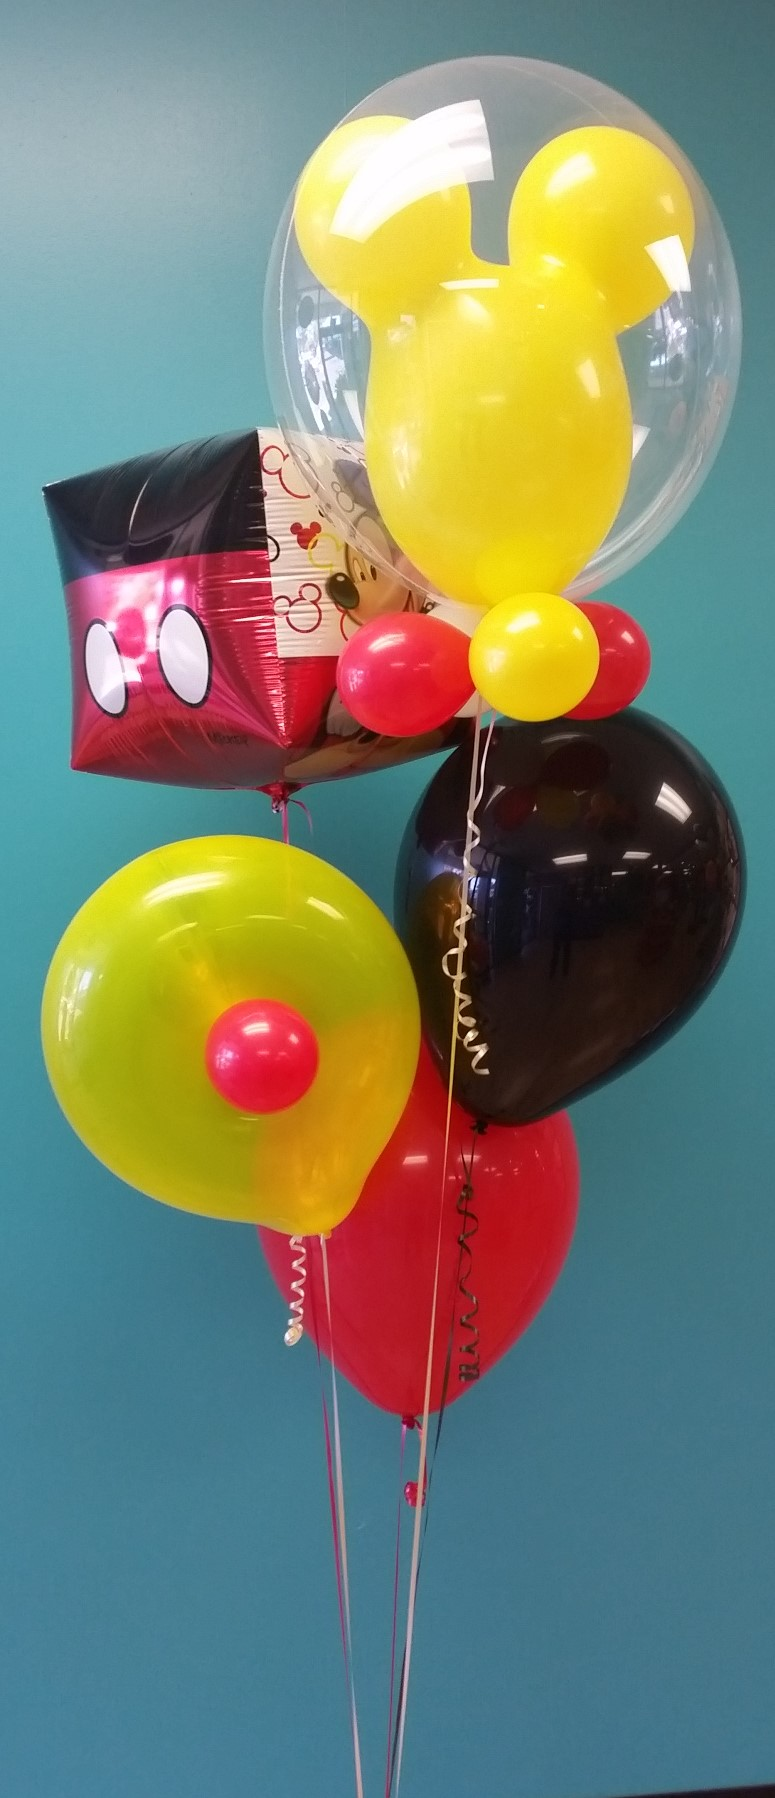 Mickey mouse balloon bouquet.jpg